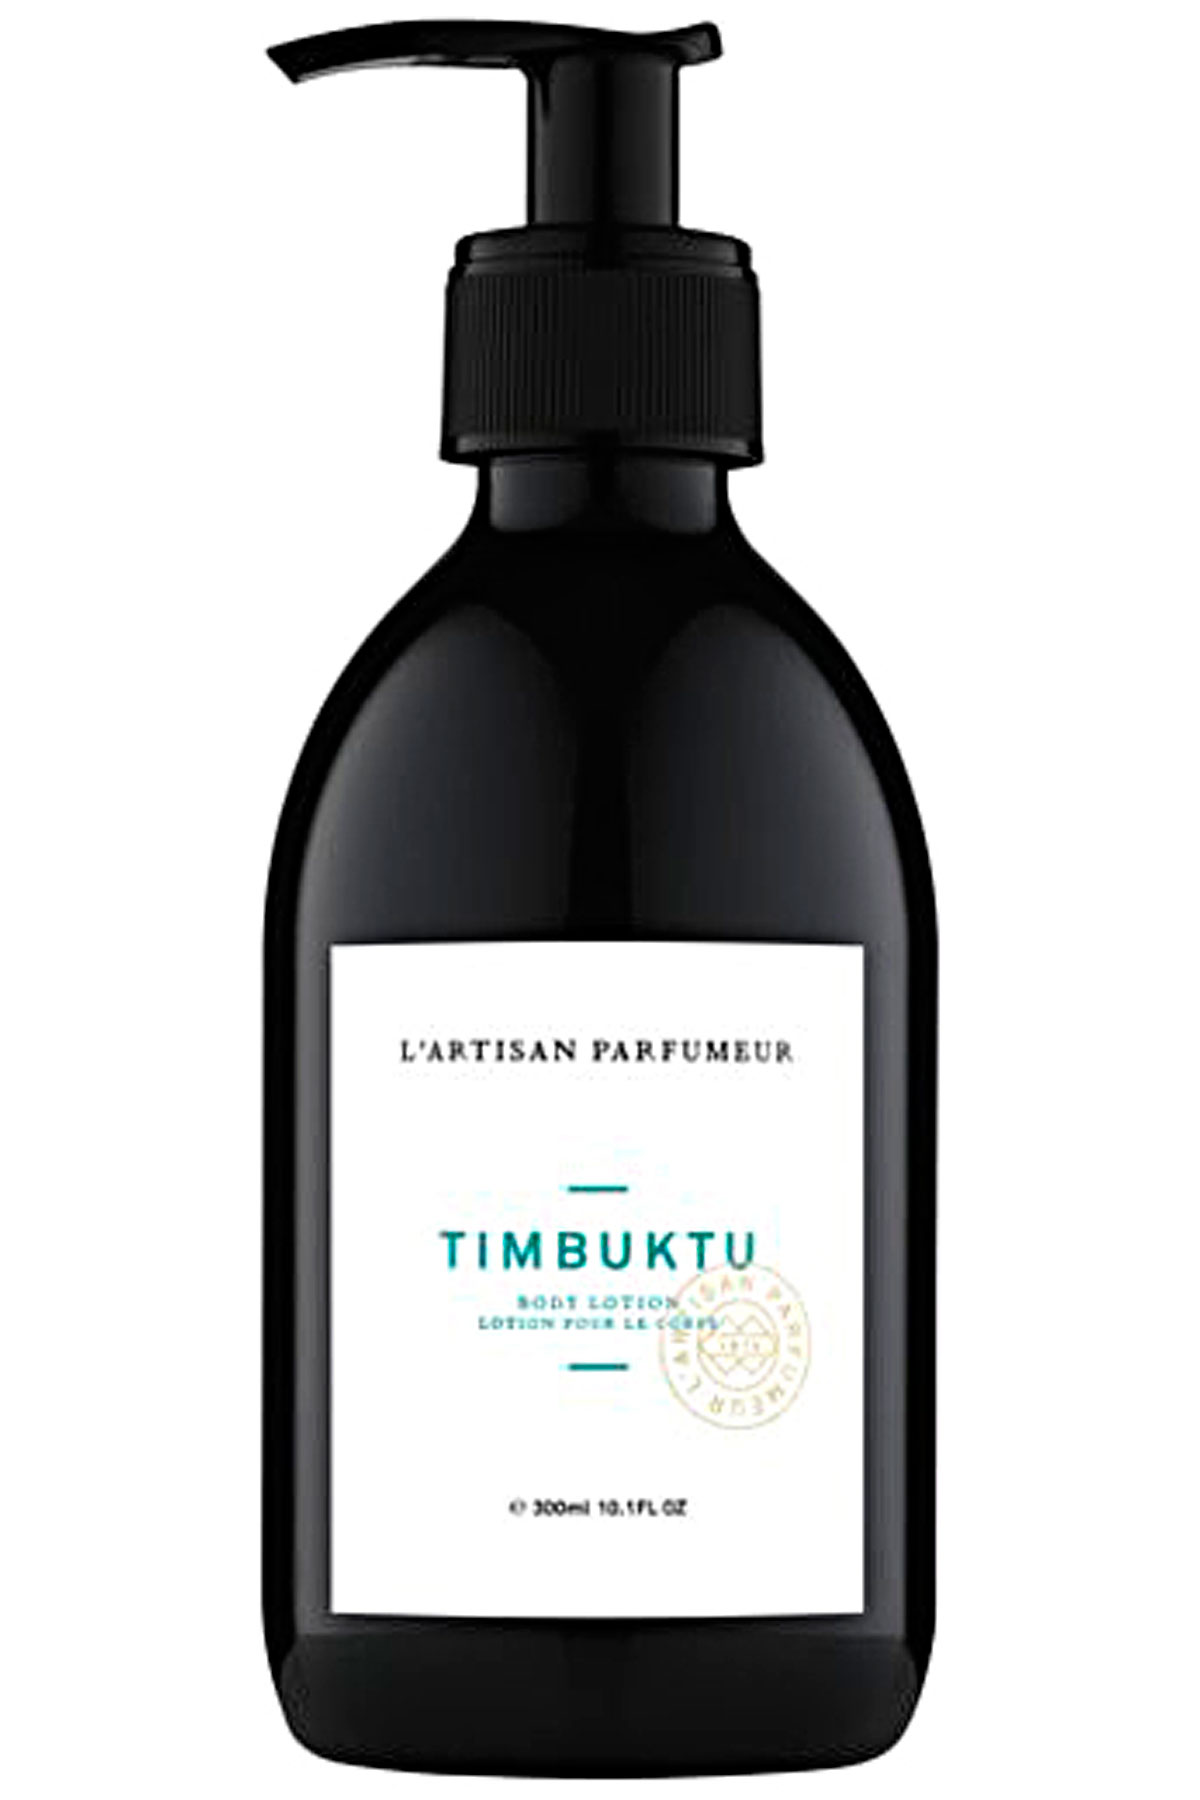 Artisan Parfumeur Beauty for Women On Sale, Timbuktu - Body Lotion - 300 Ml, 2019, 300 ml